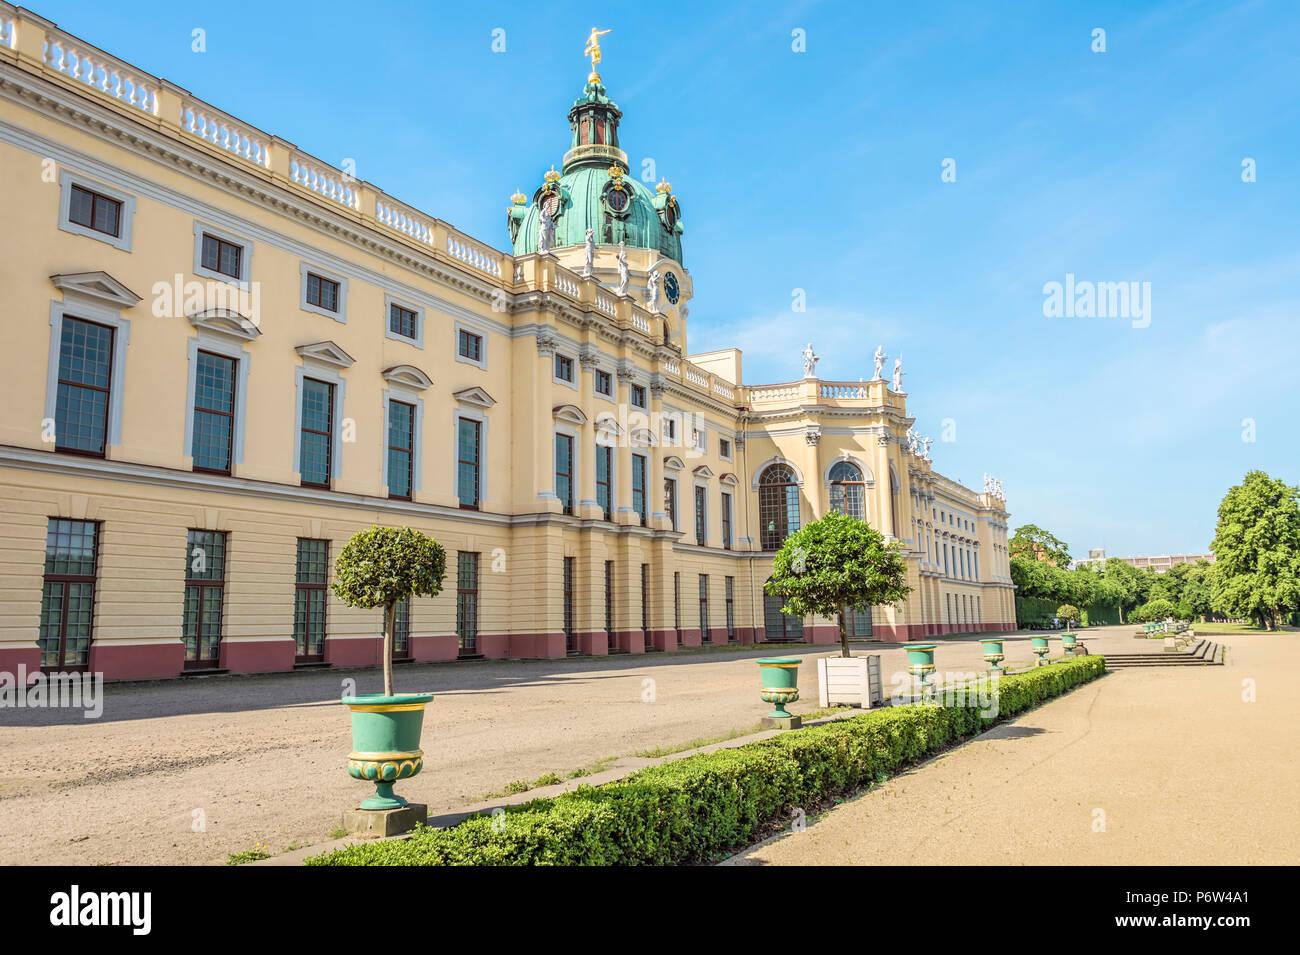 Charlottenburg Palace, Berlin, Germany | Schloss Charlottenburg, Berlin, Deutschland - Stock Image